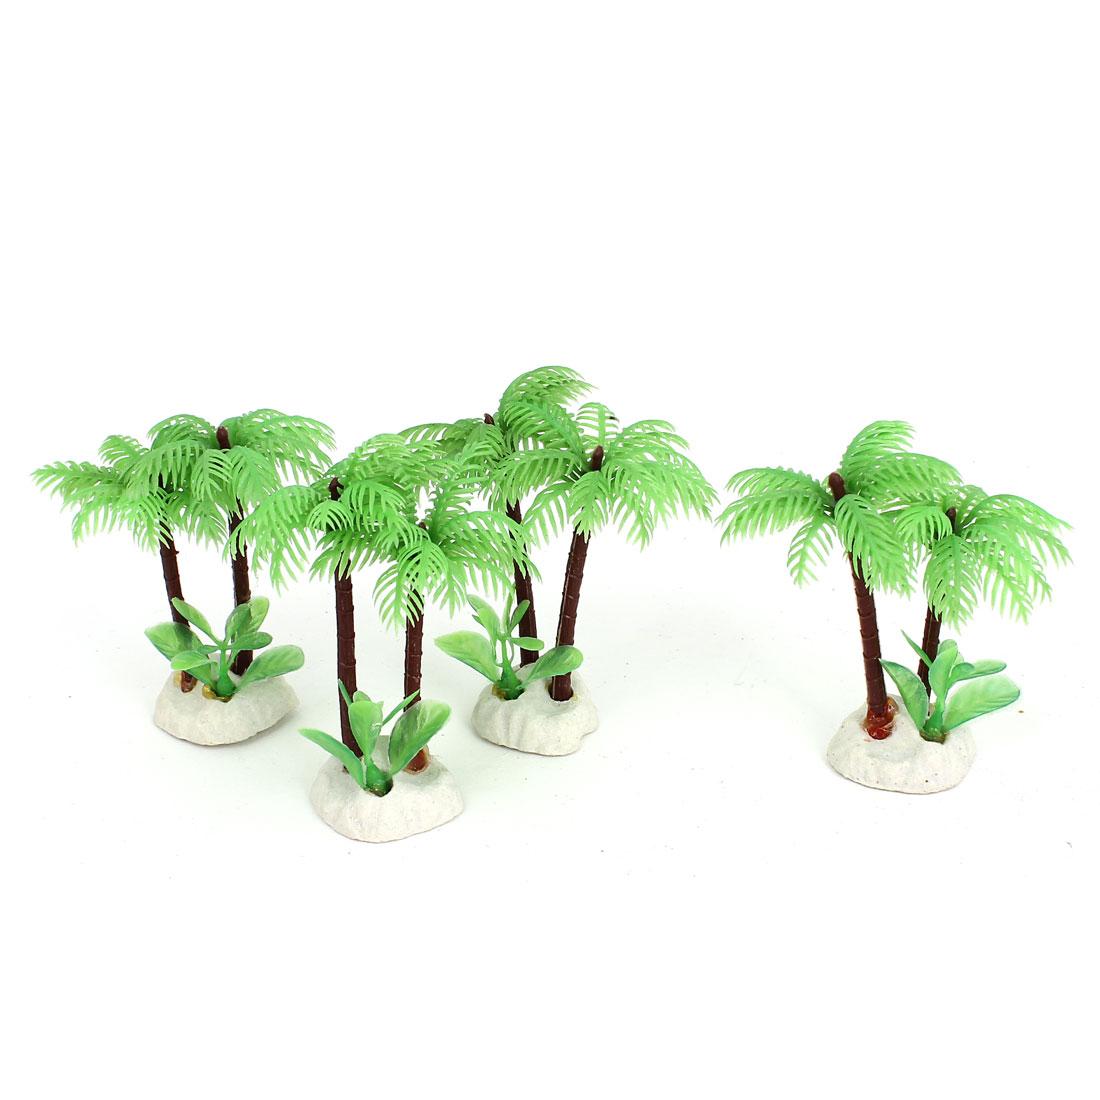 "Aquarium Plastic Emulational Coconut Tree Water Grass Plant 3"" Height 4pcs Green"